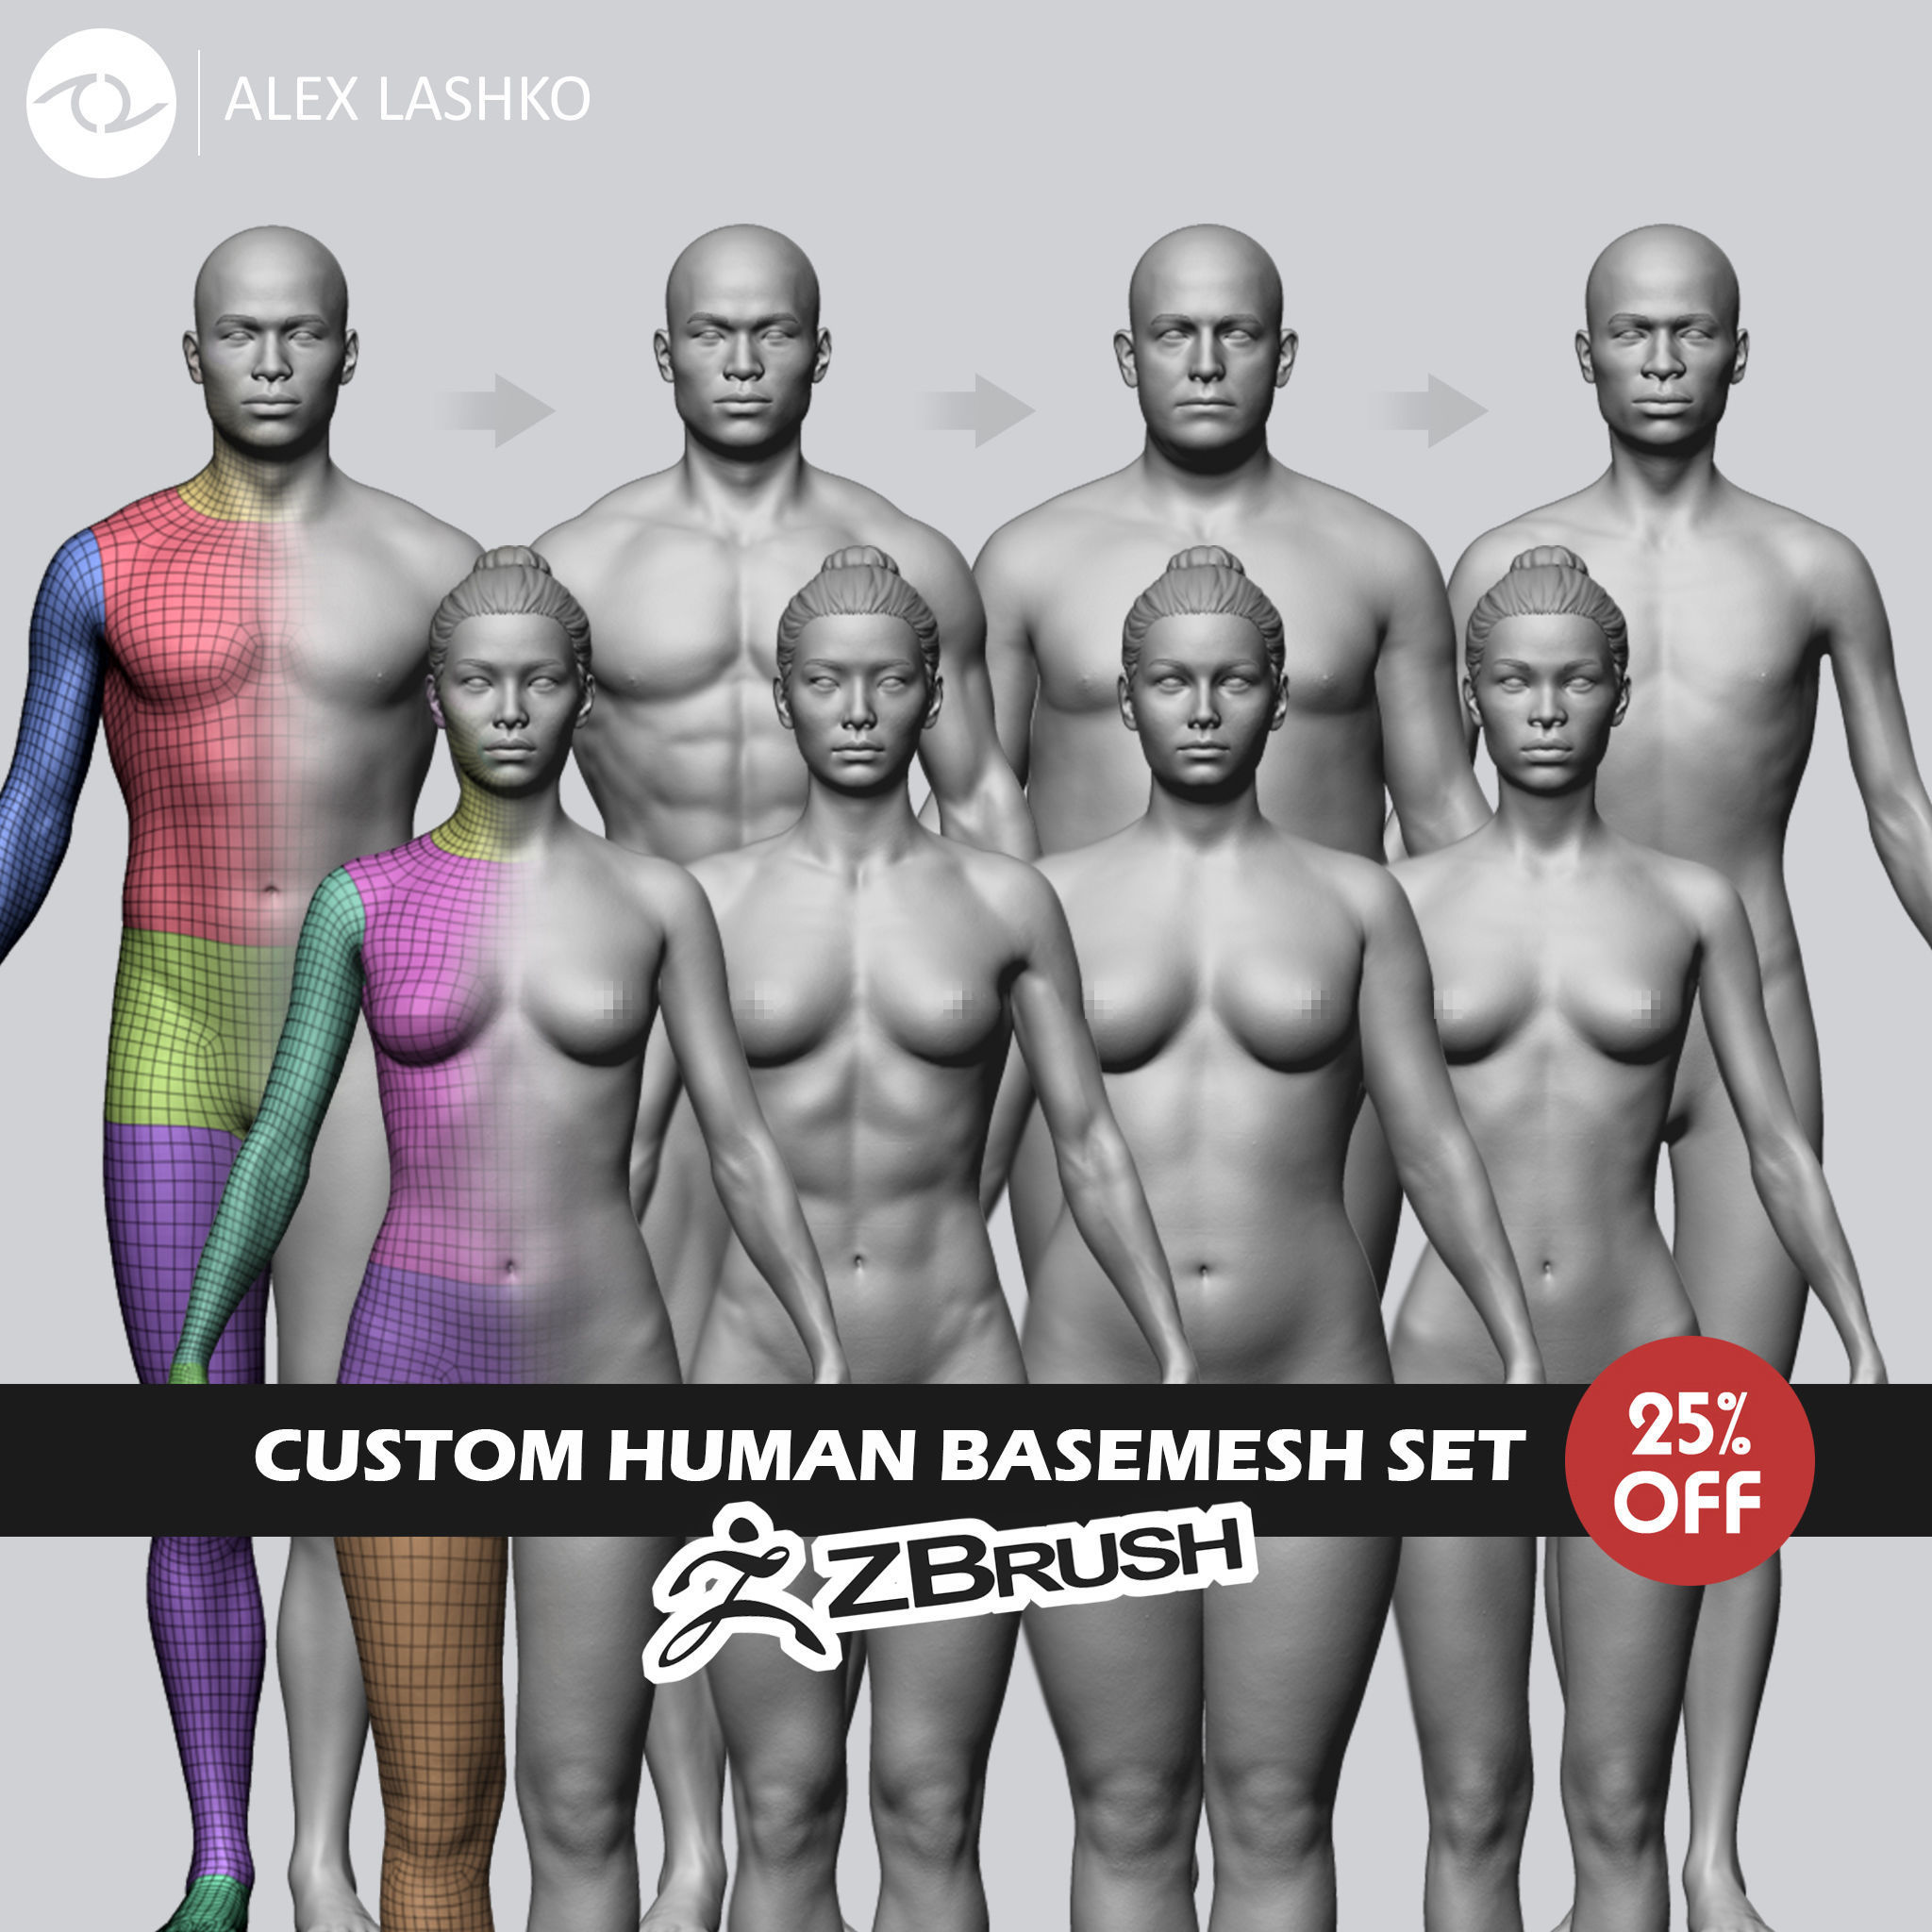 Custom Human Basemesh Set